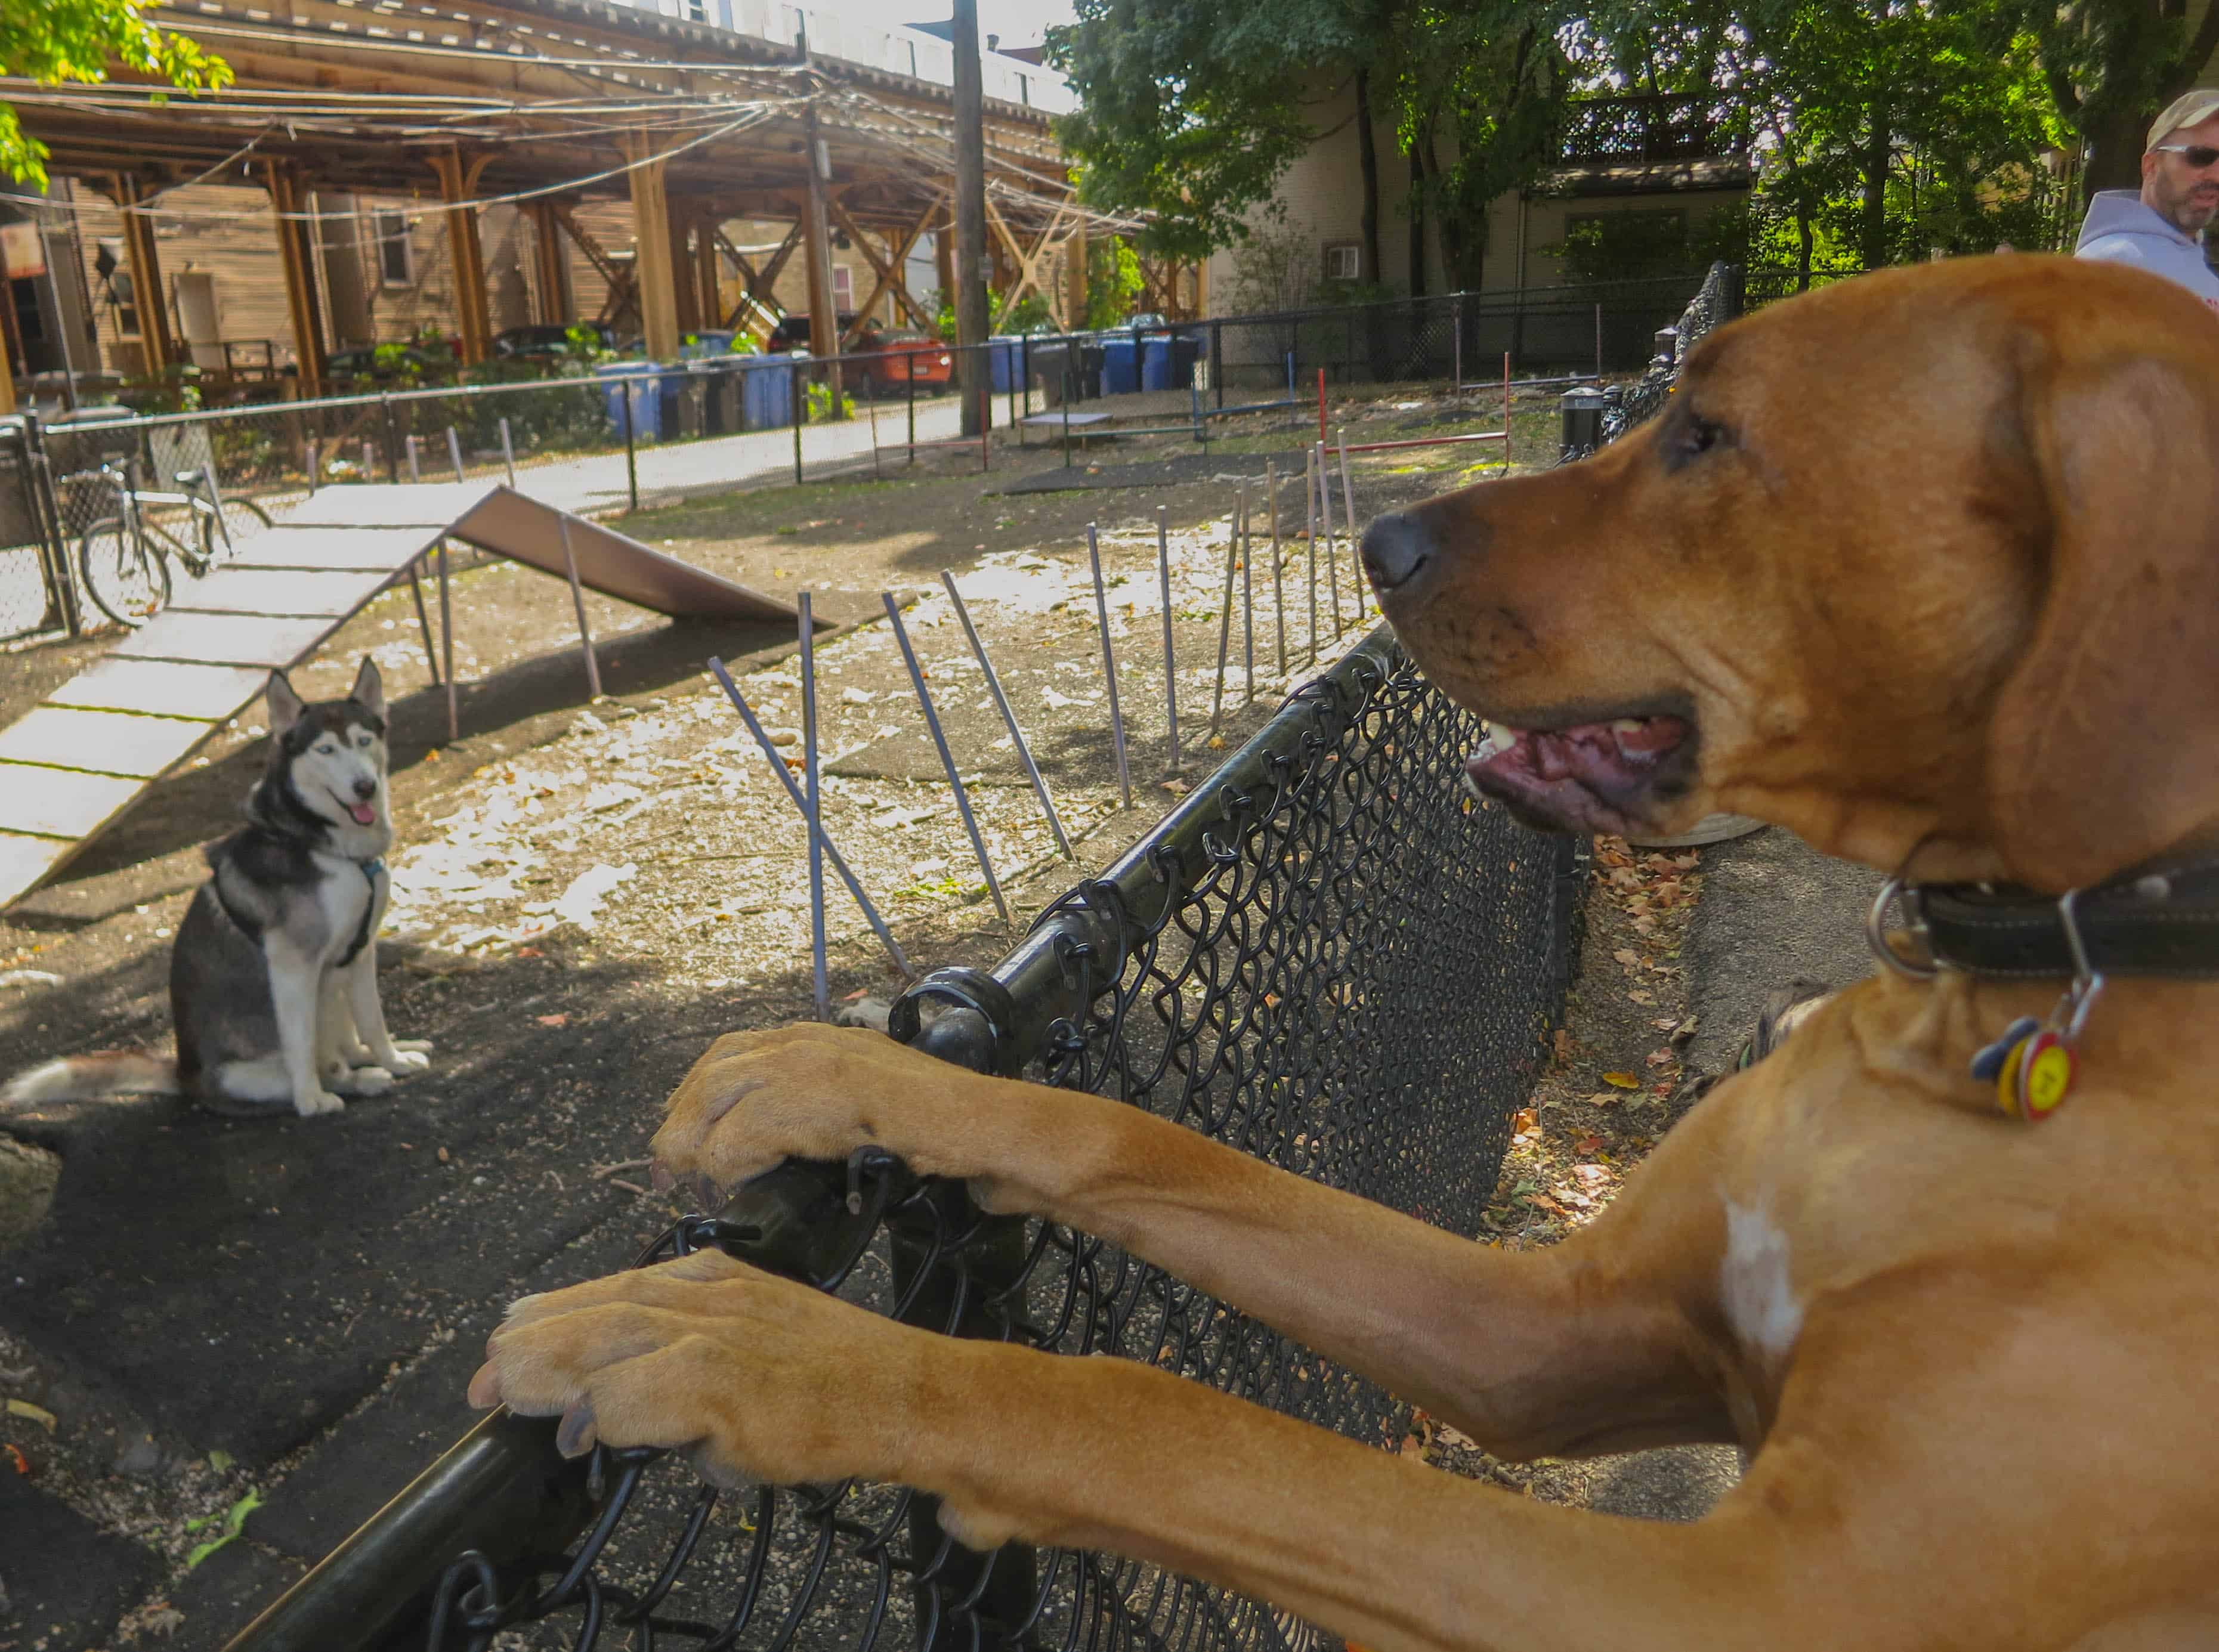 Rhodesian Ridgeback photo, pet adventure, dog blog, pet photos